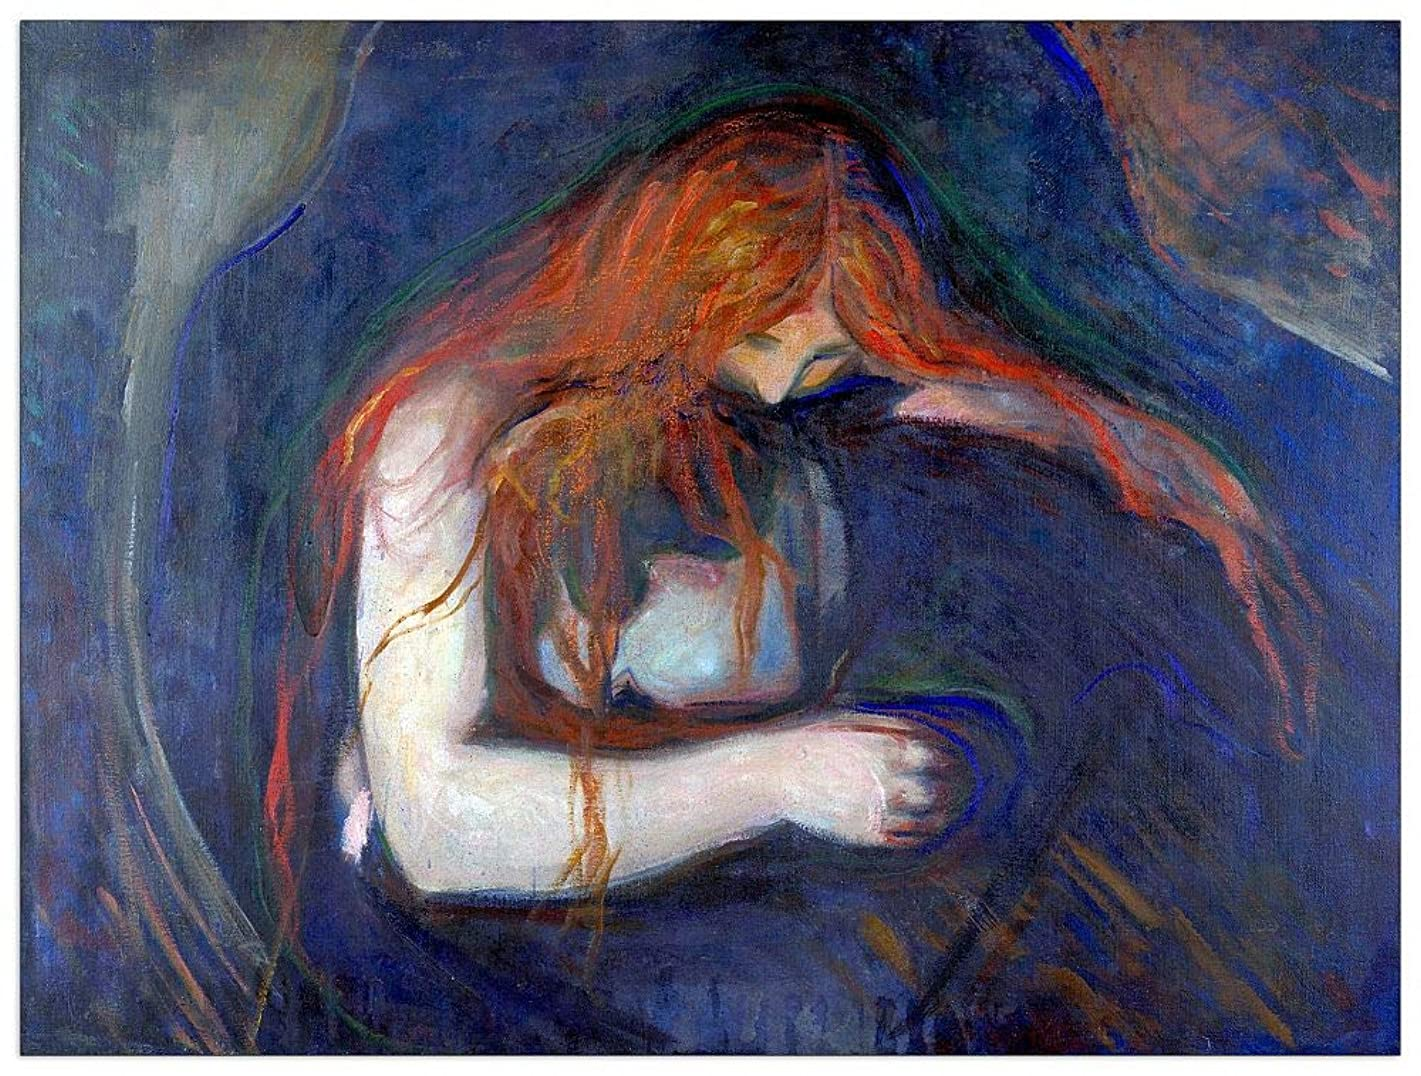 ArtPlaza TW92322 Munch Edvard-Vampire Decorative Panel, 35.5x27.5 Inch, Multicolored